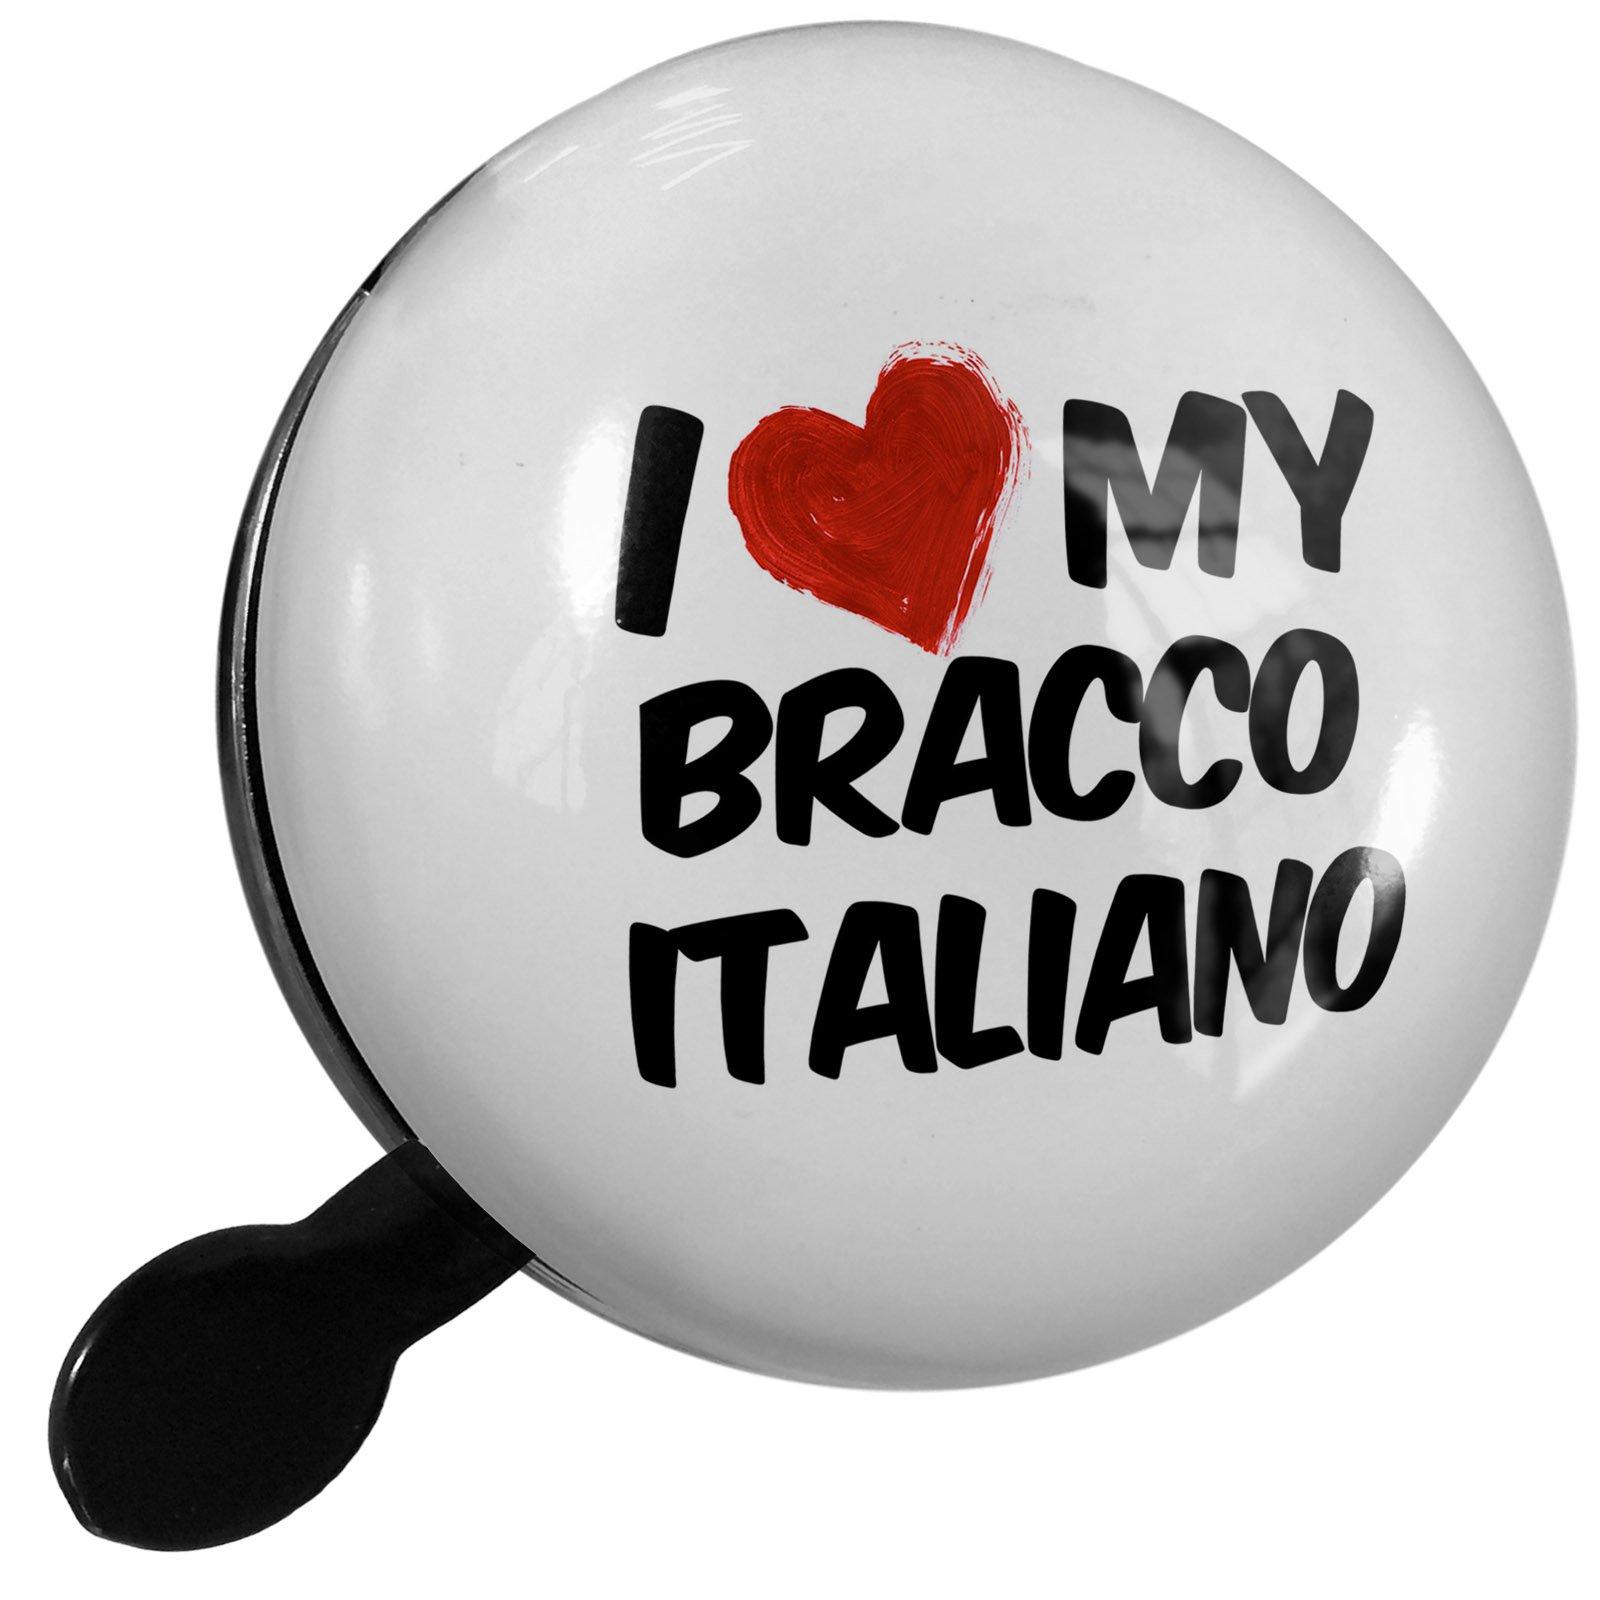 Small Bike Bell I Love my Bracco Italiano Dog from Italy - NEONBLOND